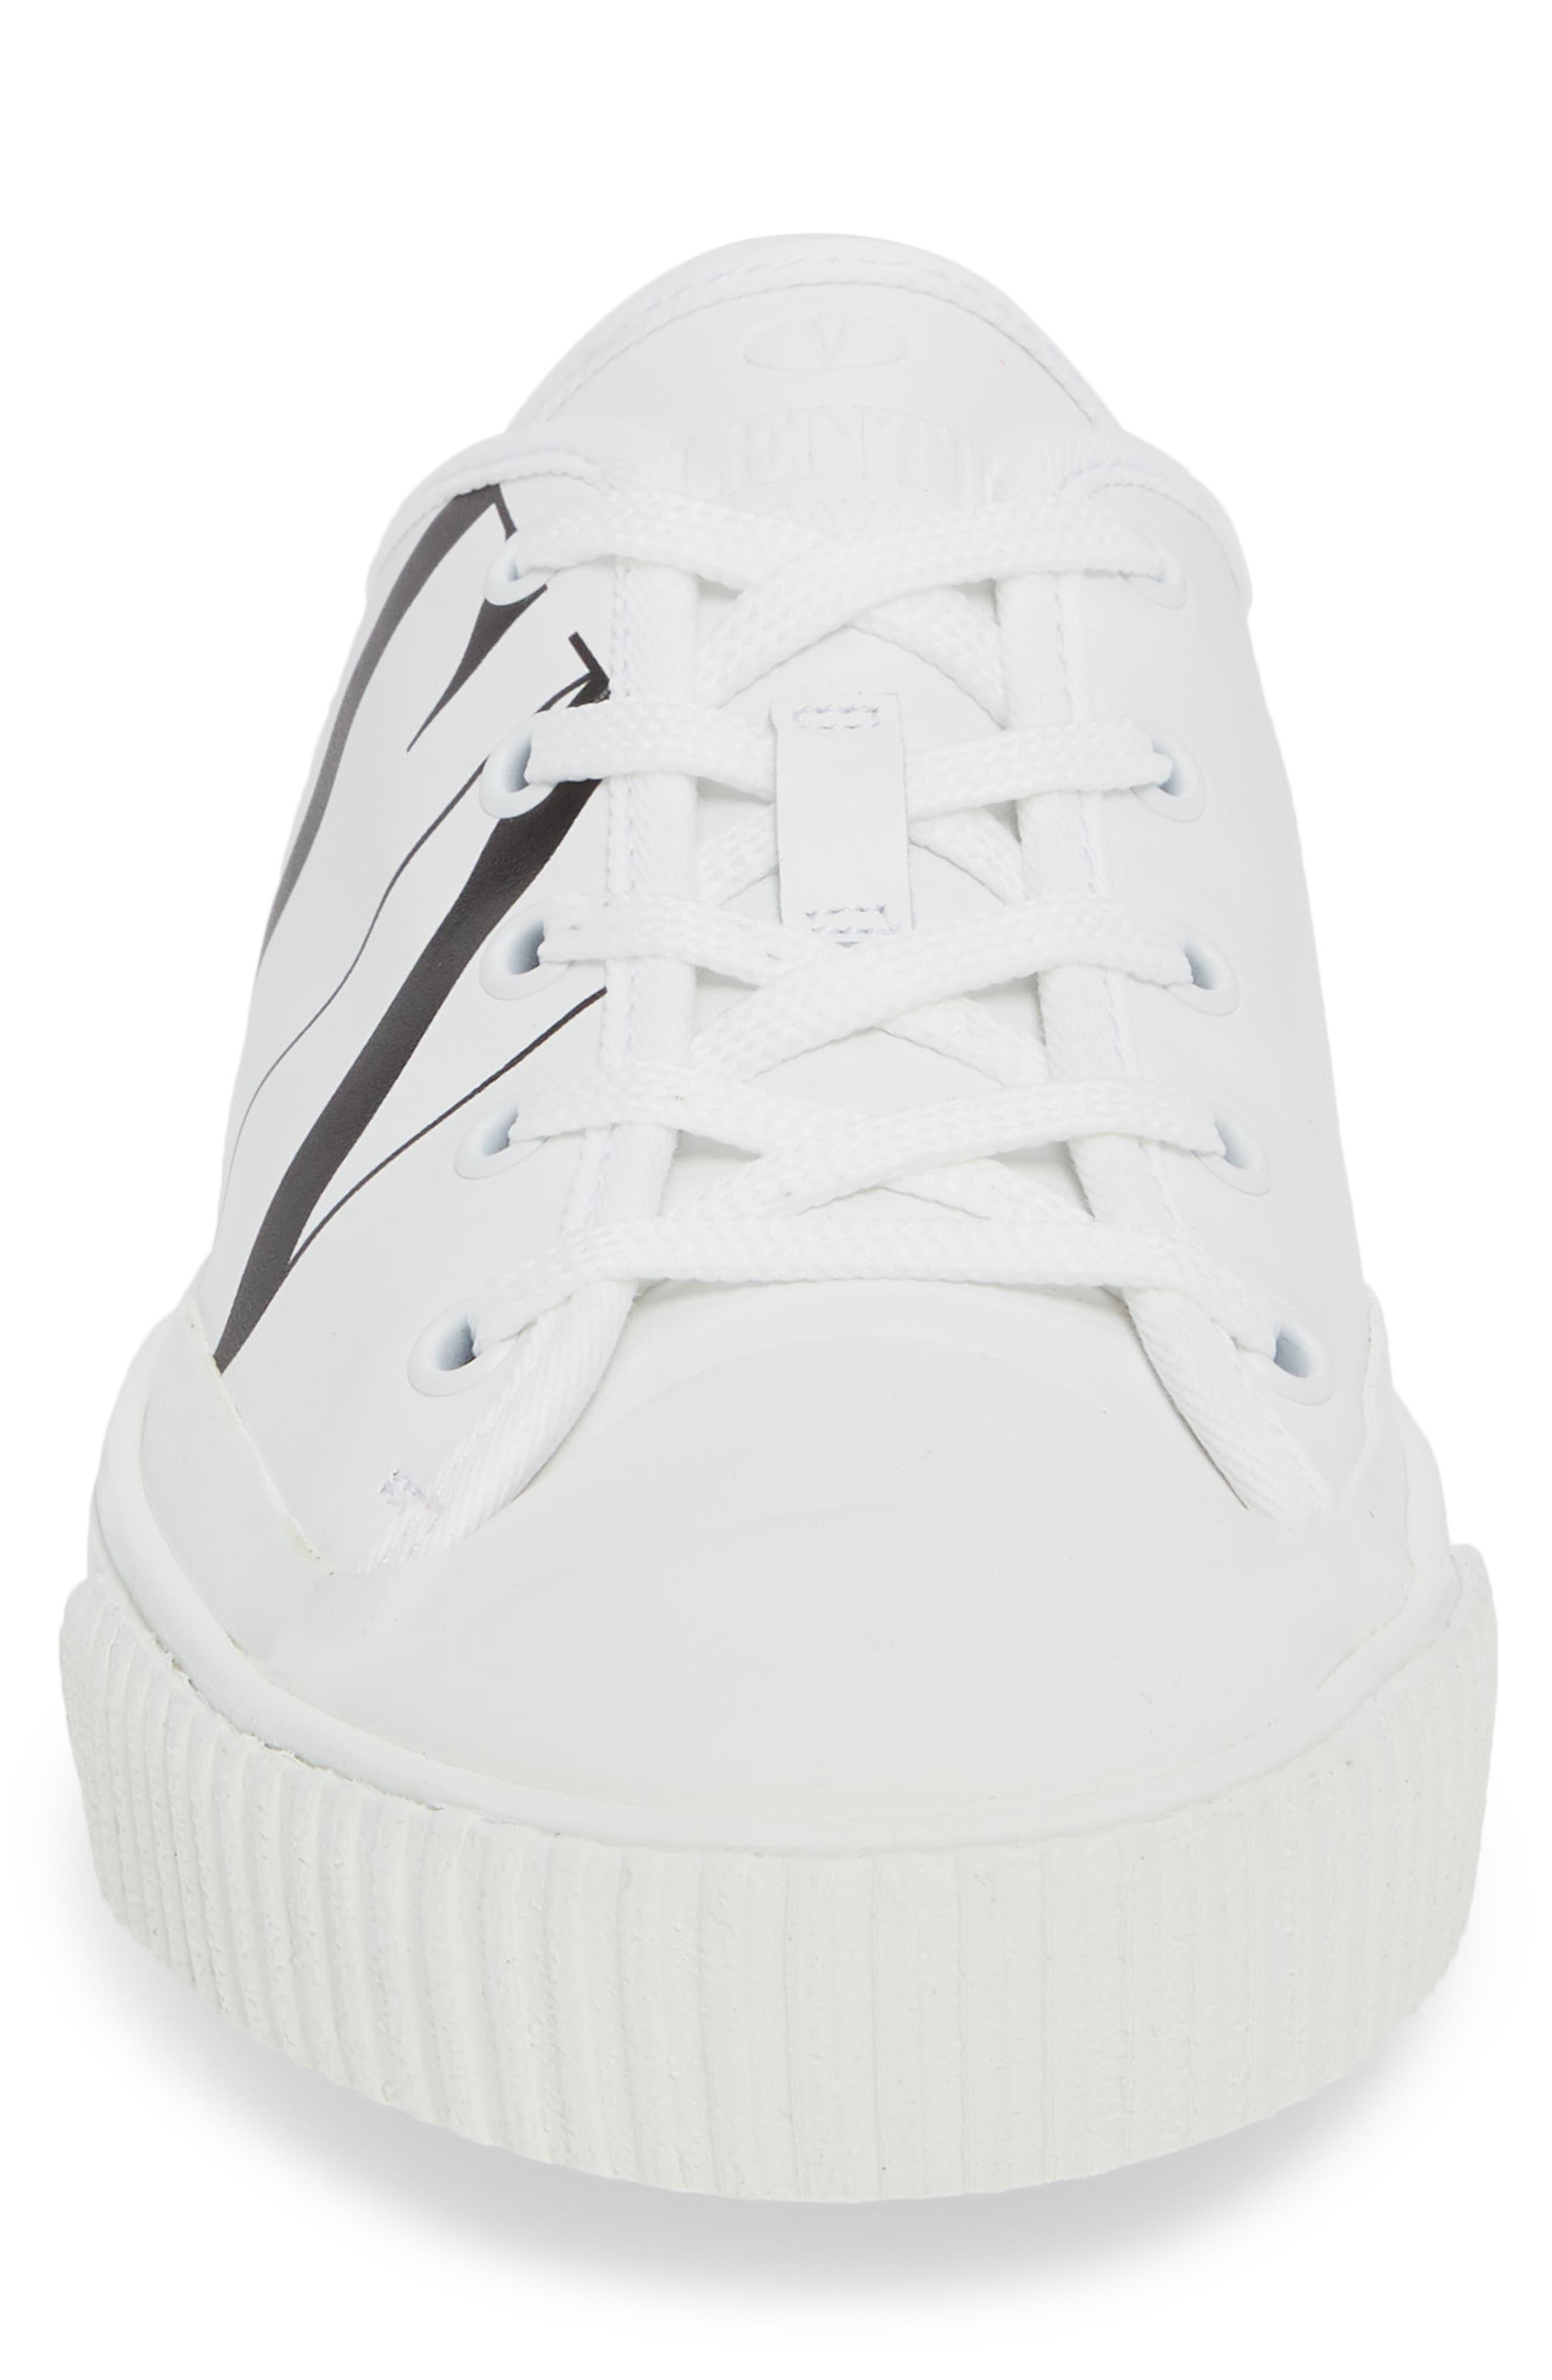 VLTN Low Top Sneaker,                             Alternate thumbnail 4, color,                             102